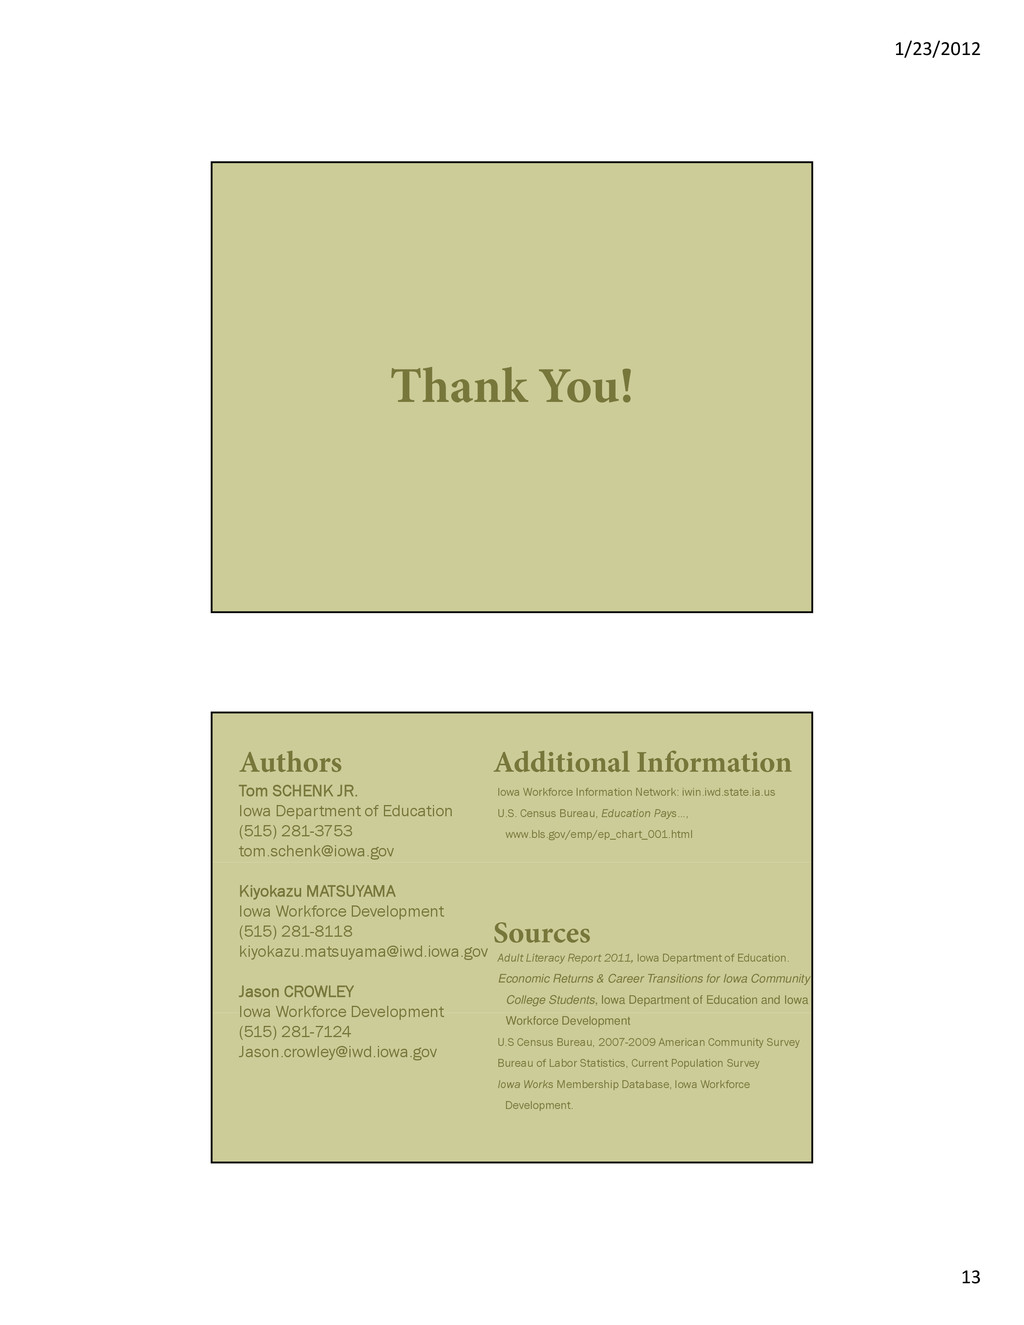 1/23/2012 13 Thank You! Authors Tom SCHENK JR. ...